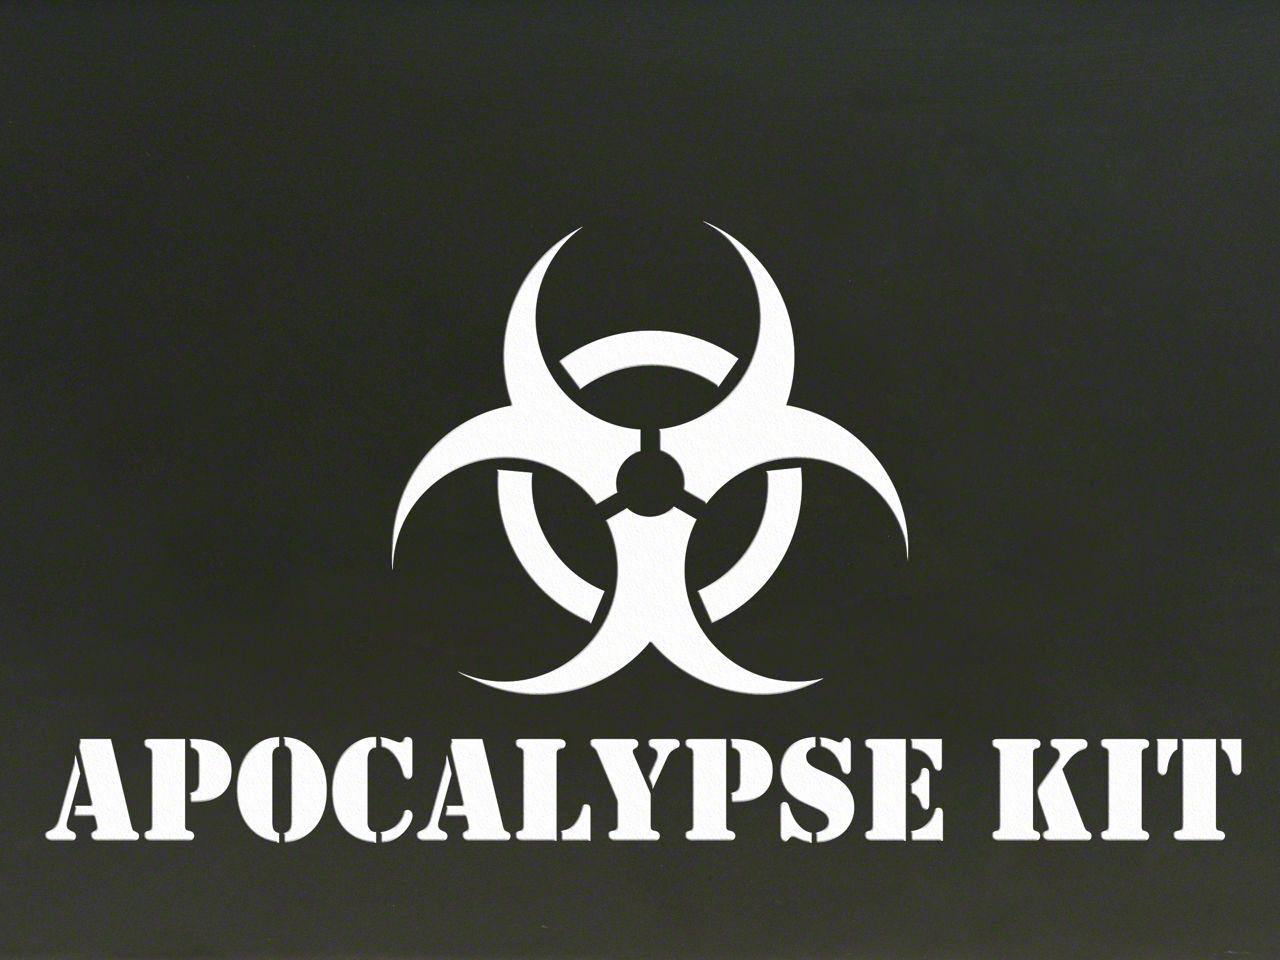 Apocalypse Kit Decal - White (87-19 Jeep Wrangler YJ, TJ, JK & JL)